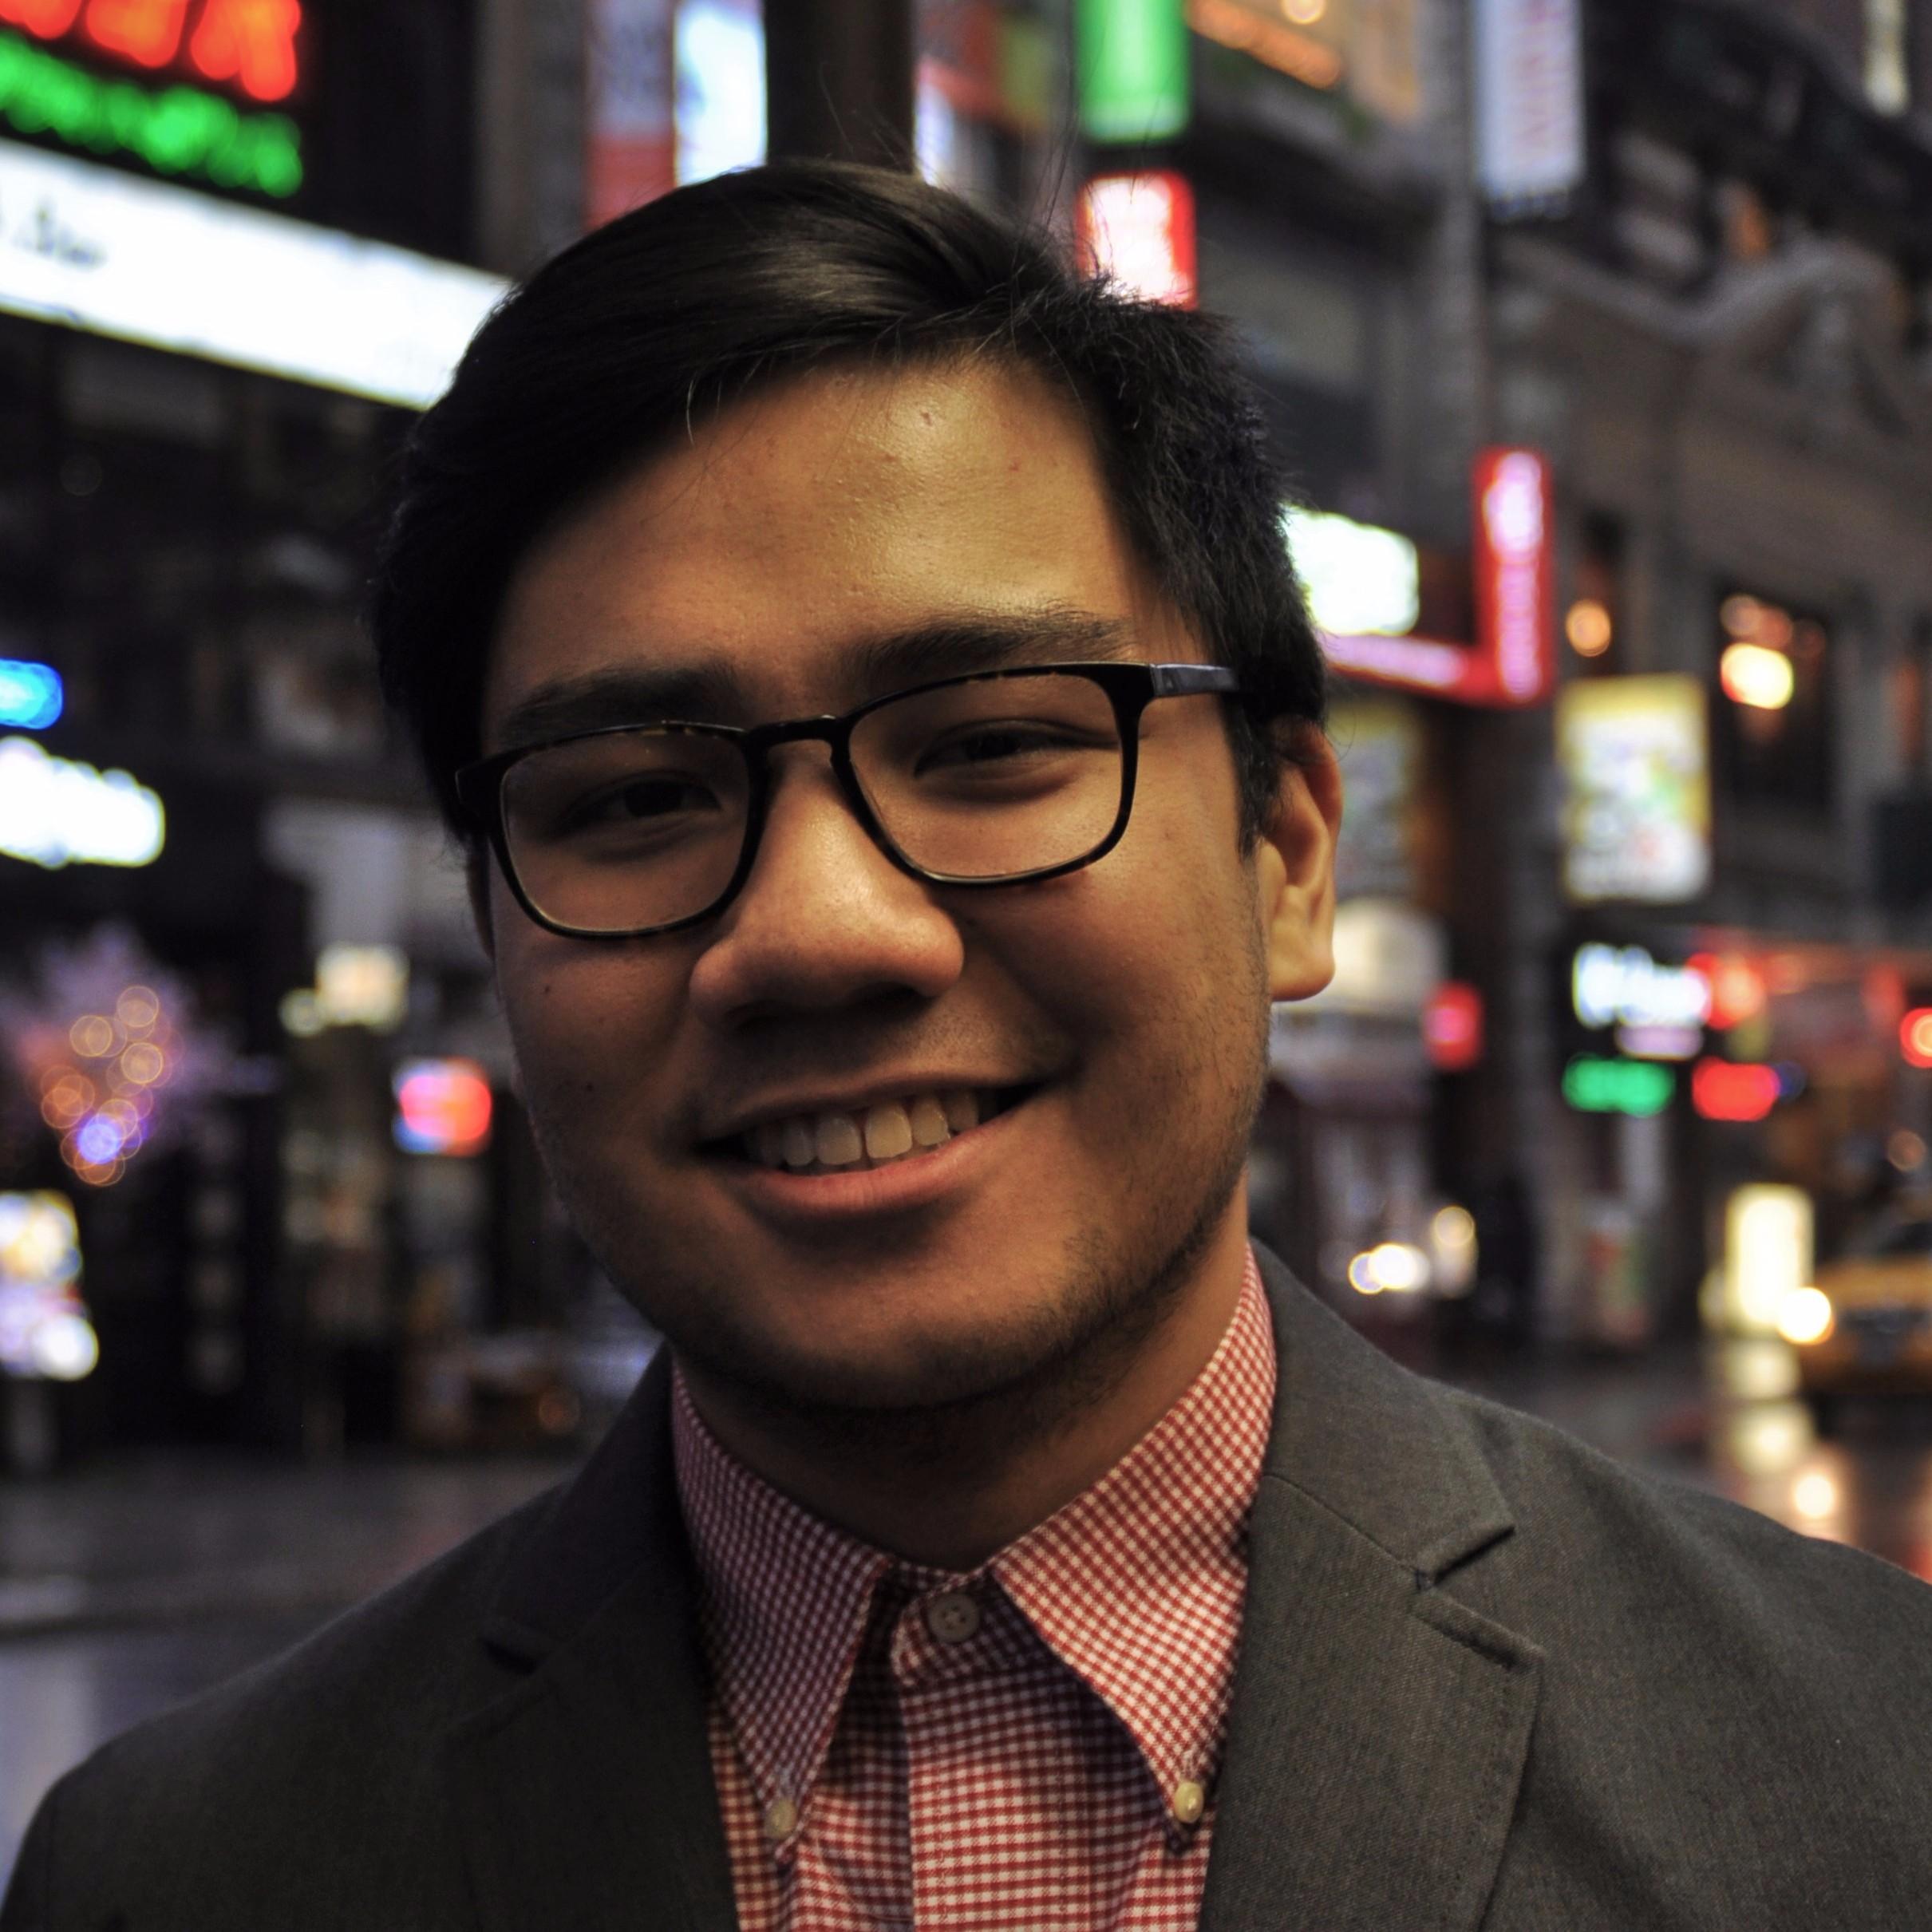 J. Profile Image